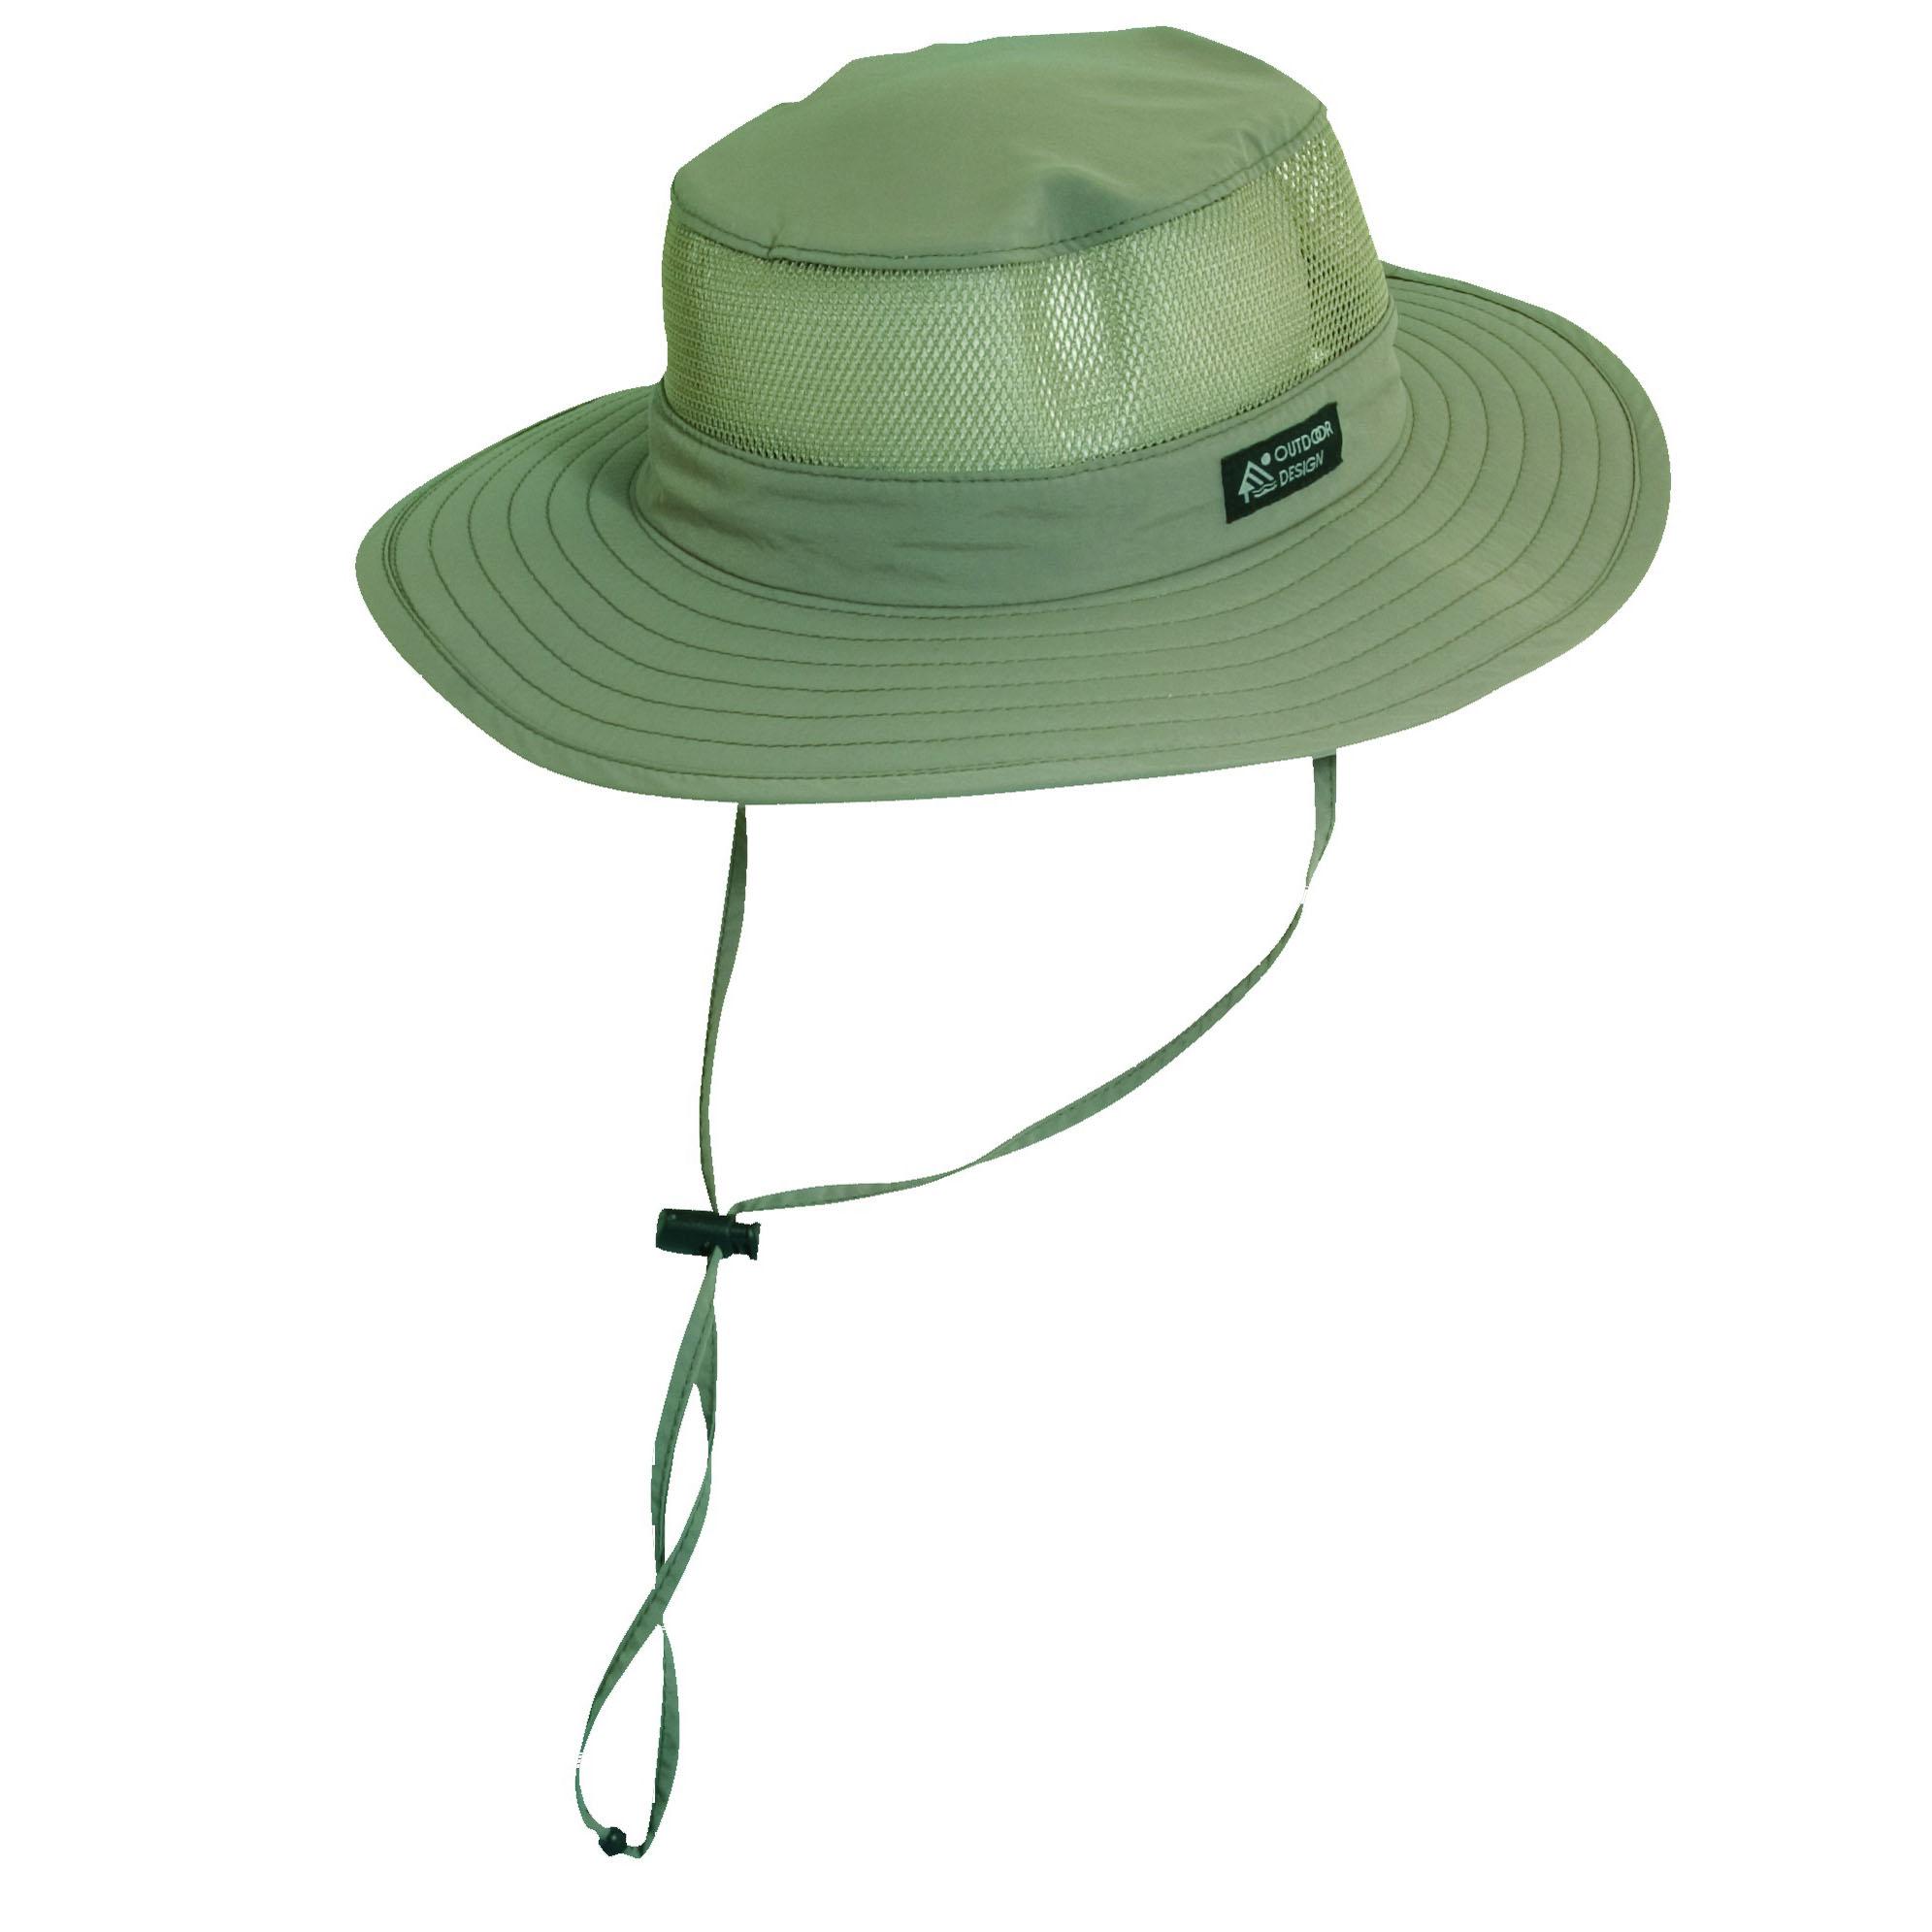 Supplex Nylon Boonie Hat With Mesh Sidewall Explorer Hats 9daa0b7afa8